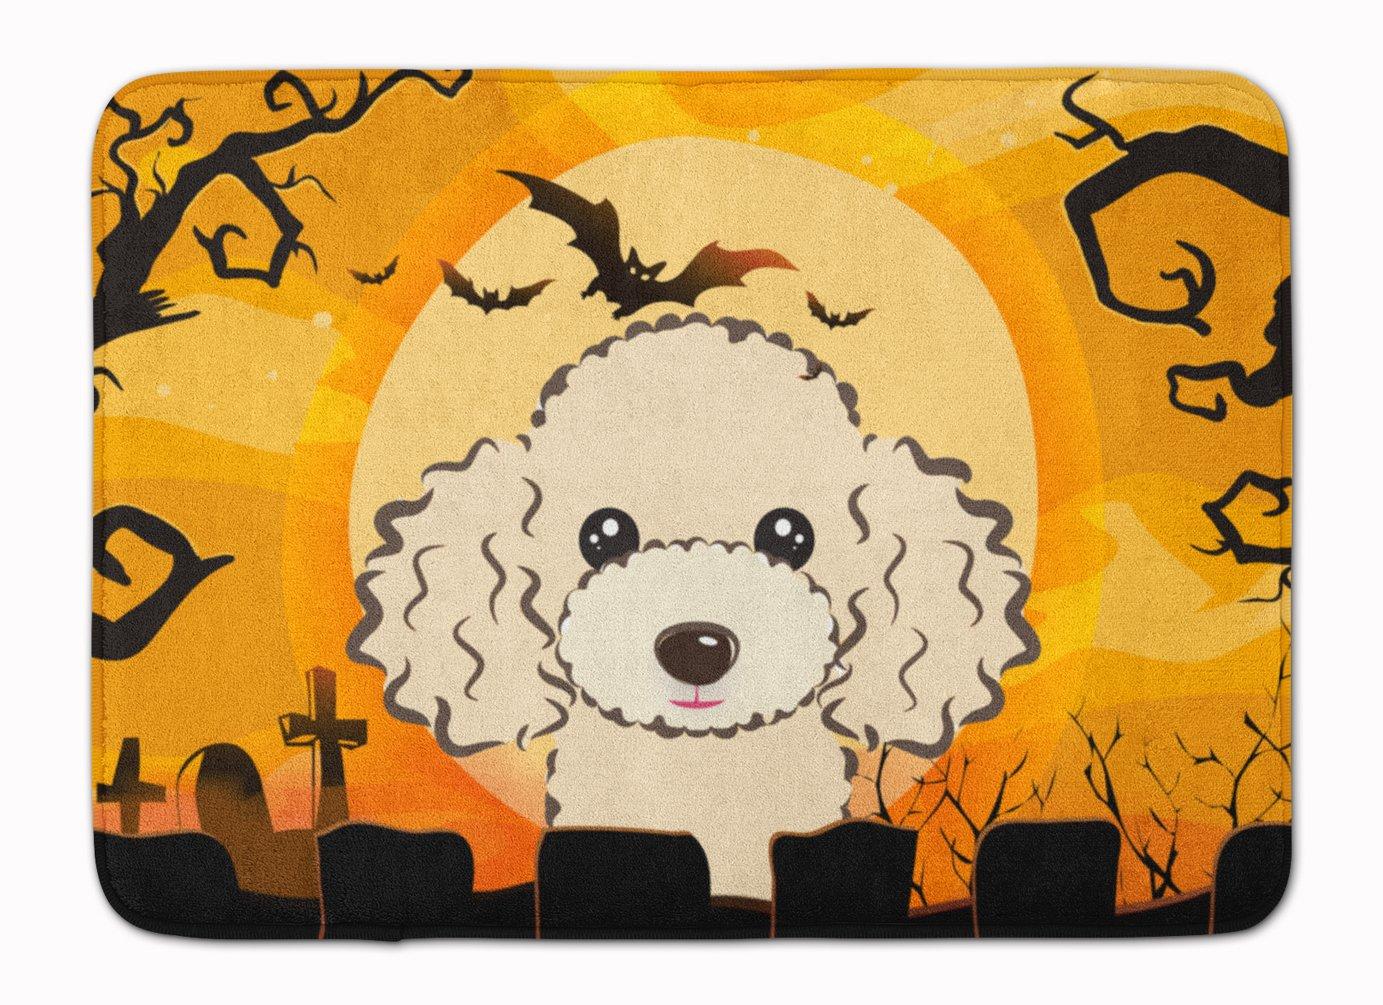 Carolines Treasures Halloween Buff Poodle Floor Mat 19 x 27 Multicolor